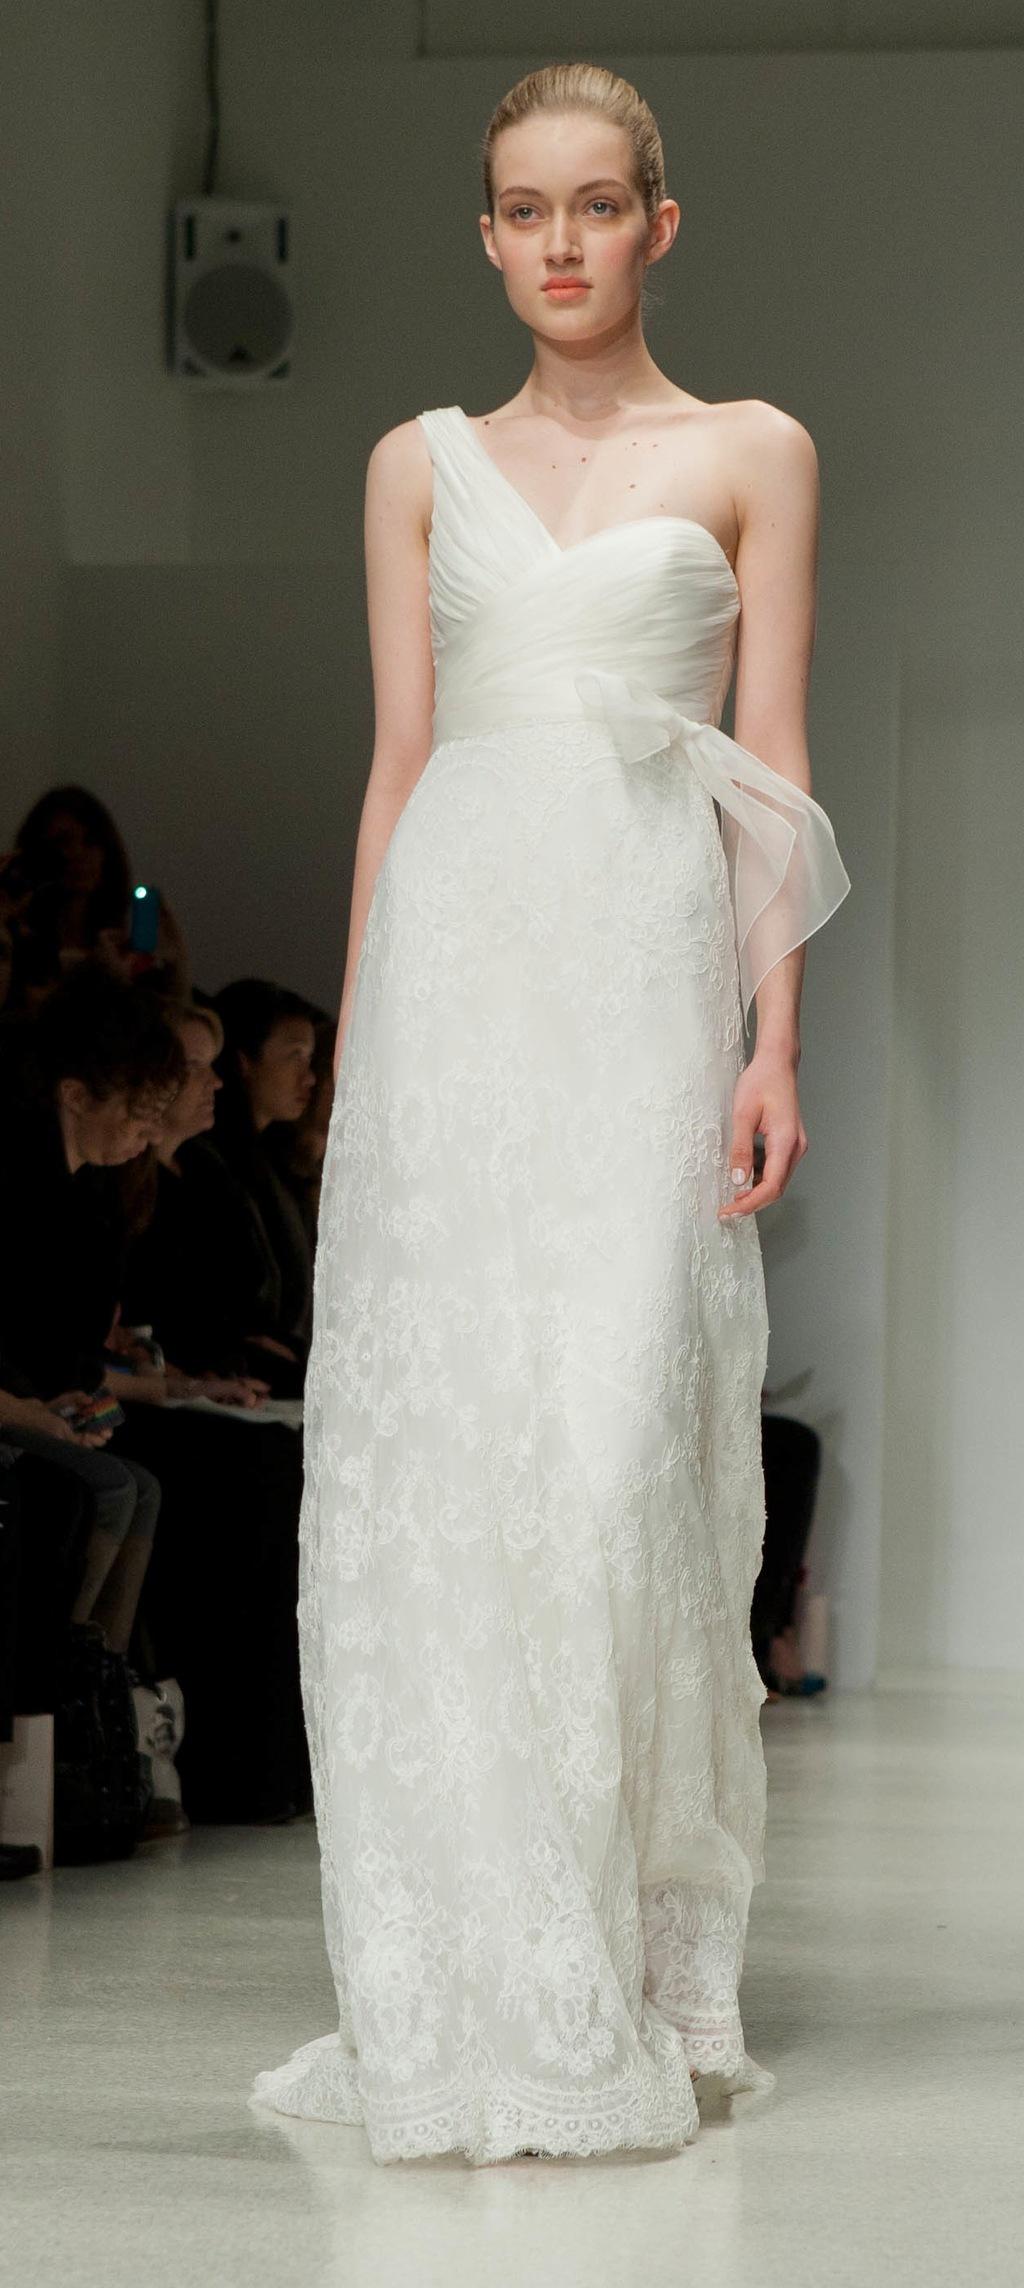 2012_wedding_dress_christos_bridal_gowns_0453.full